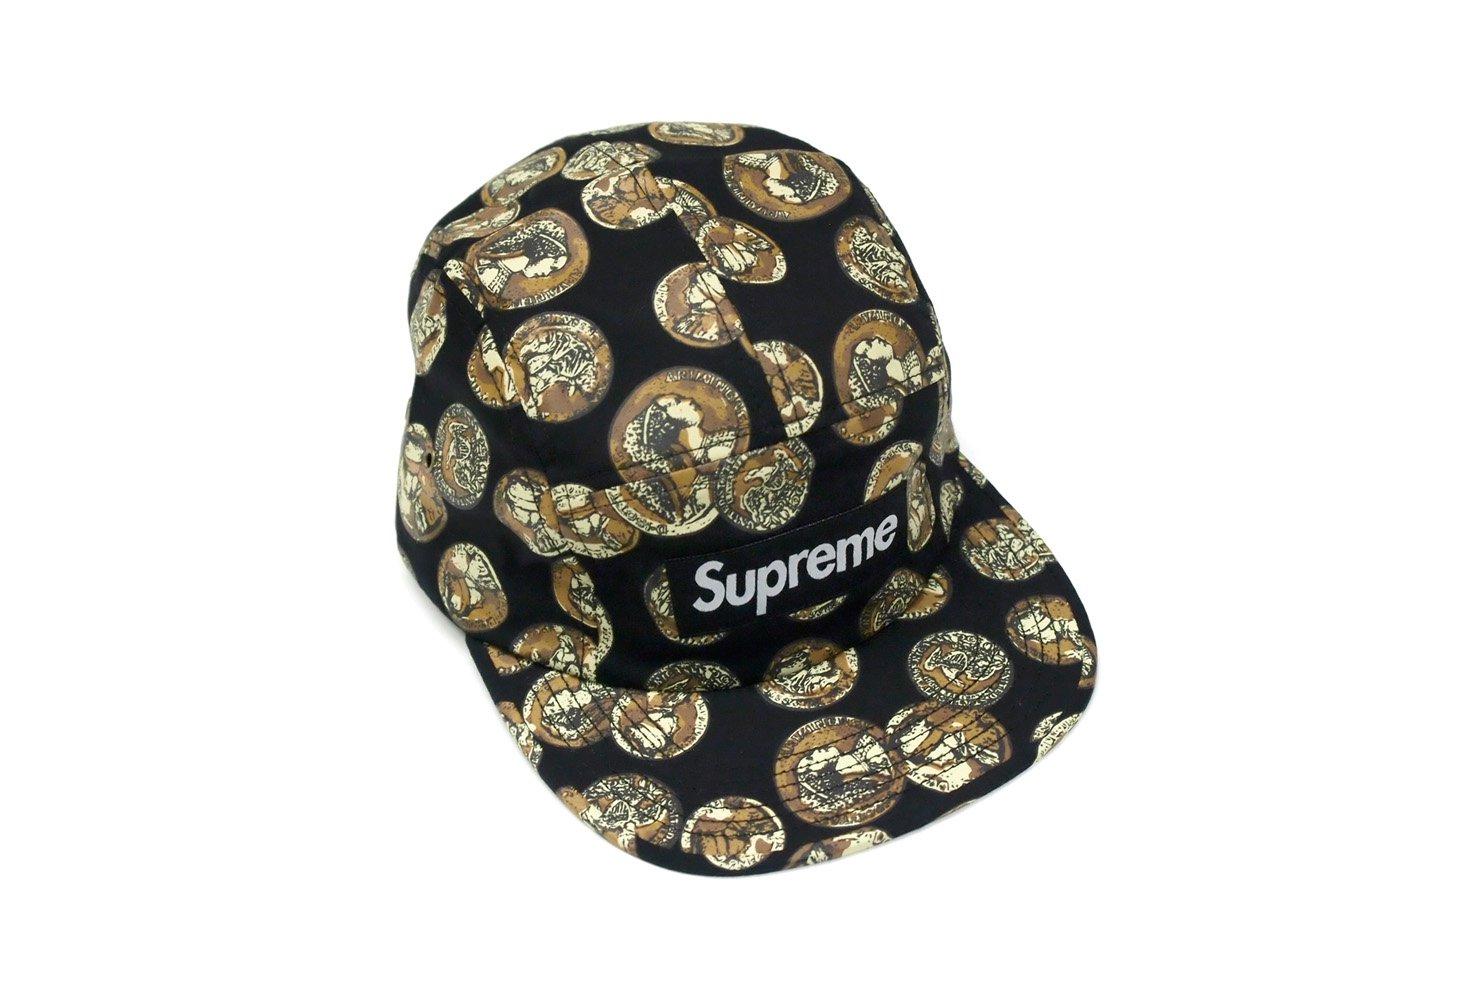 d9b90868c78 Supreme - Sup Camp Cap - ParkSIDER